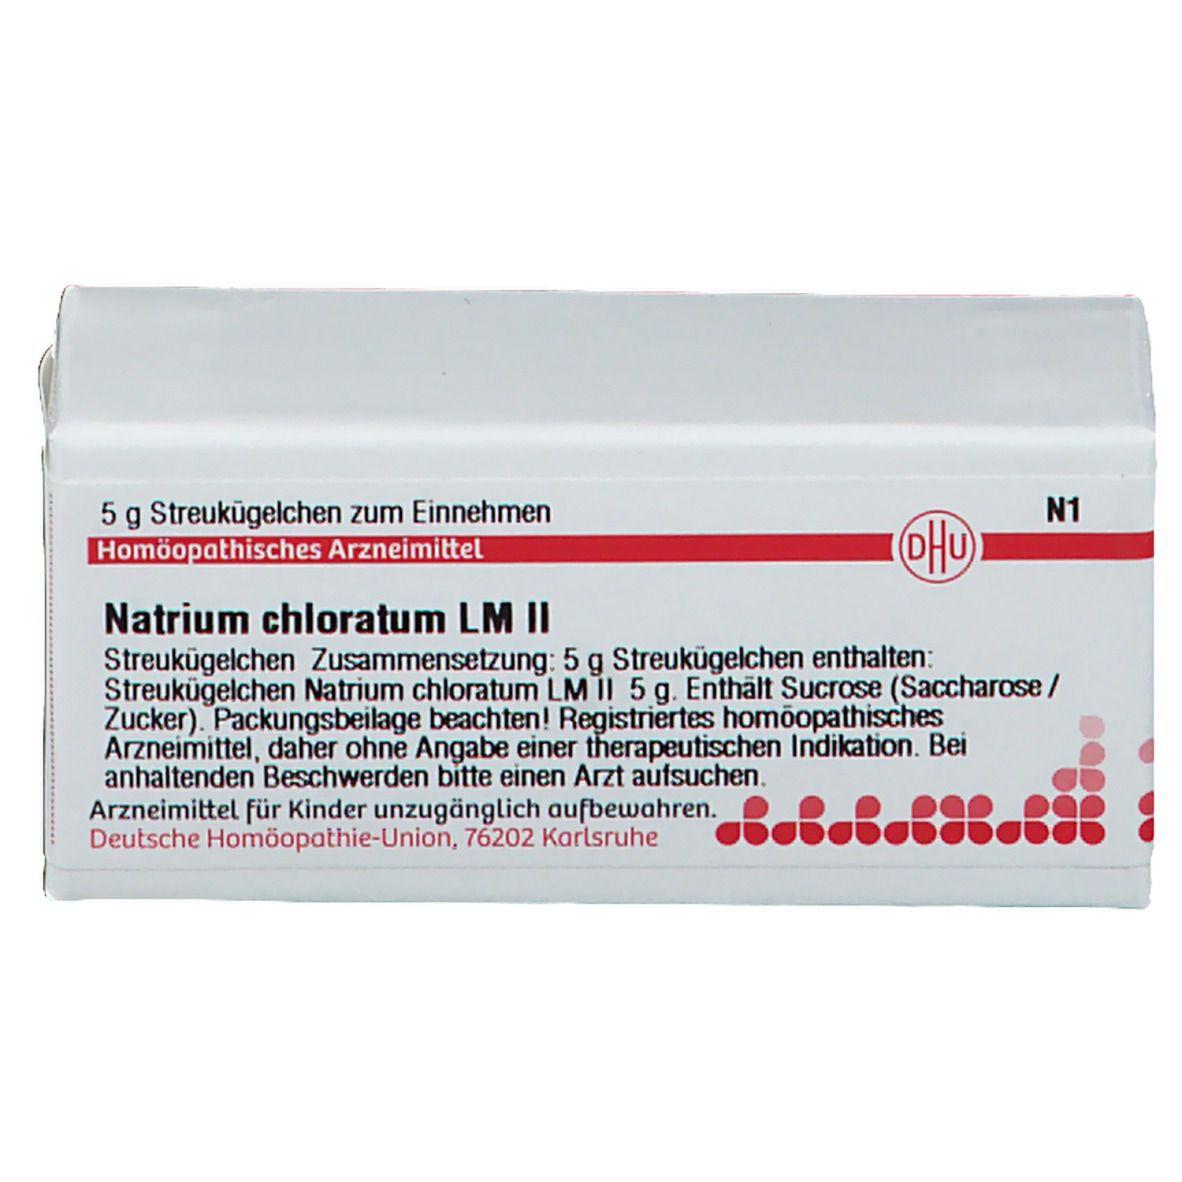 DHU Natrium Chloratum LM II